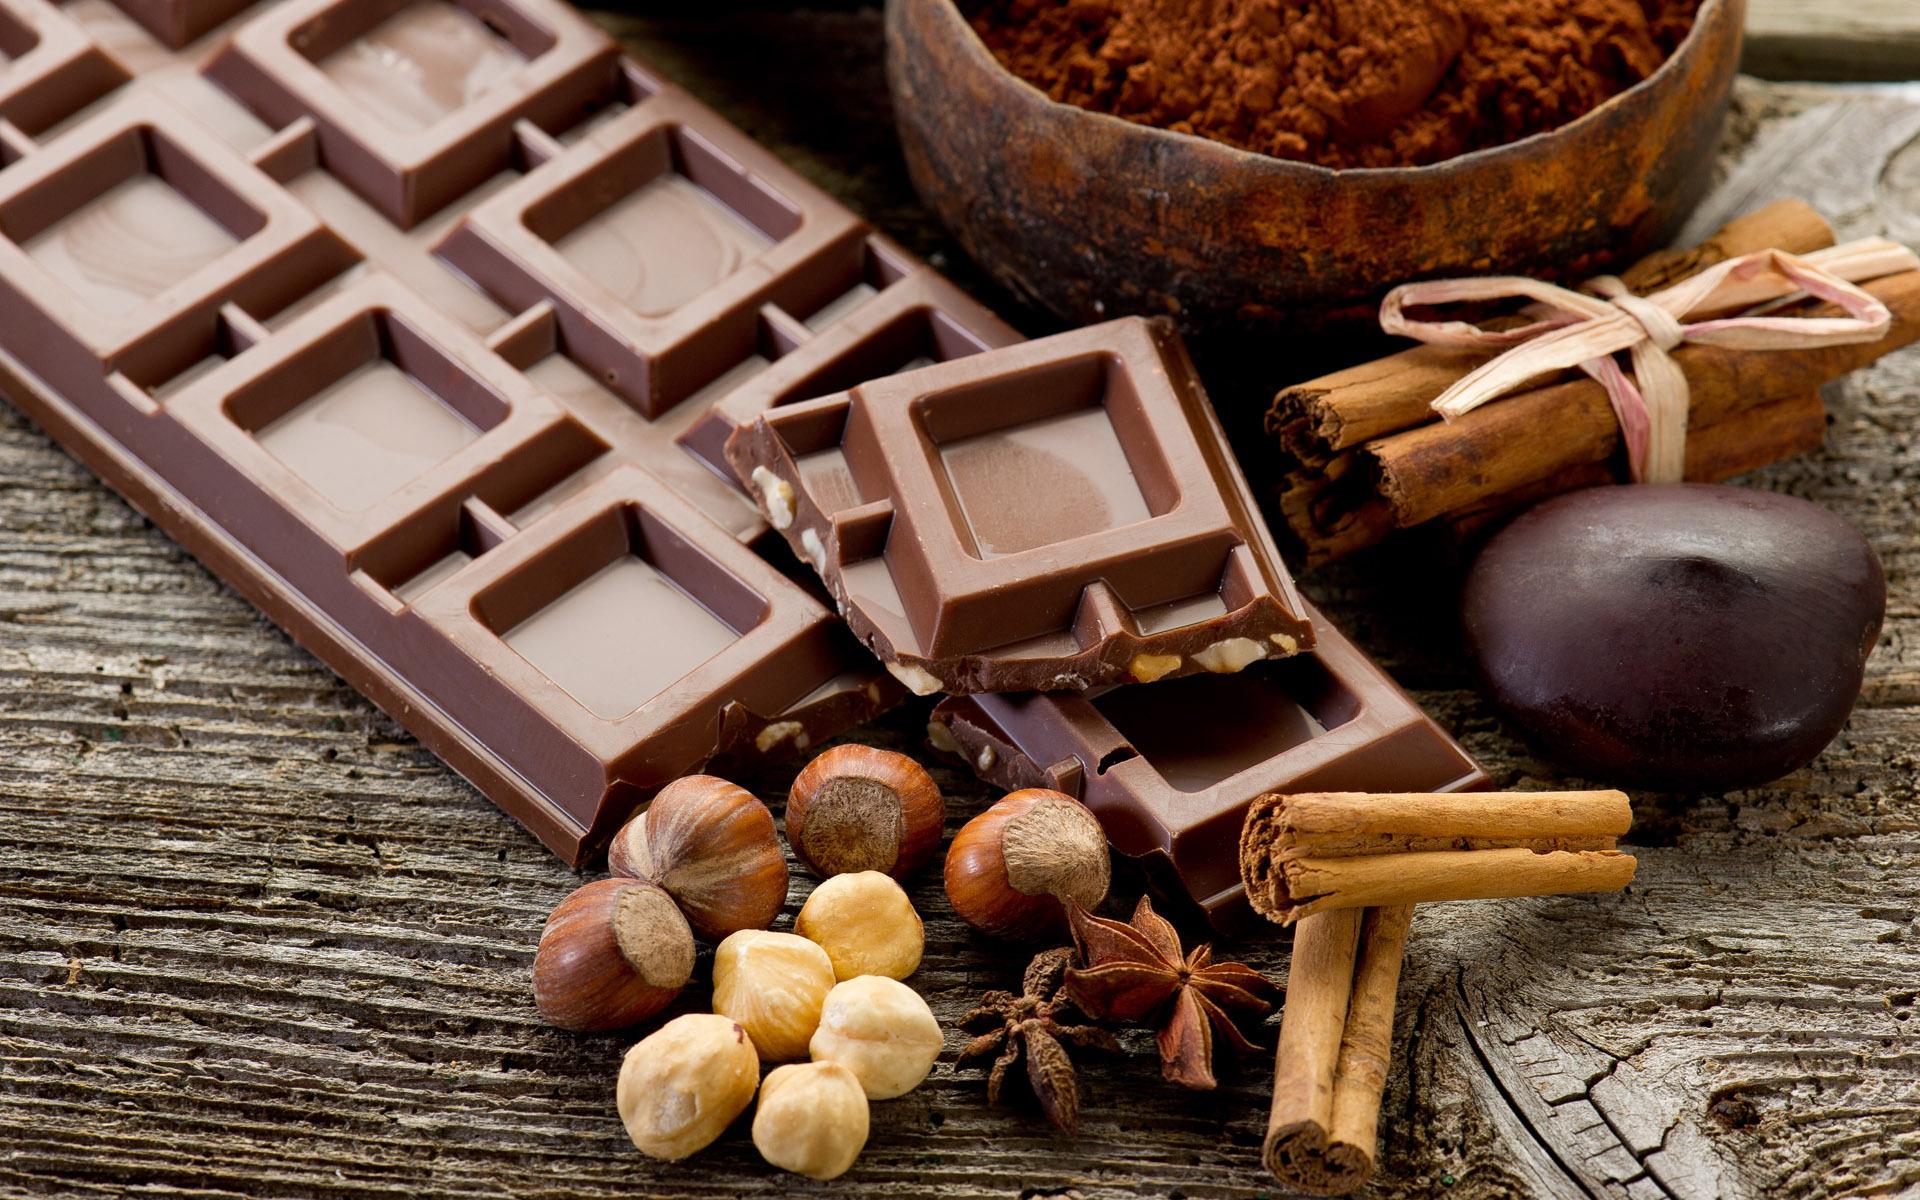 Картинки с шоколадом